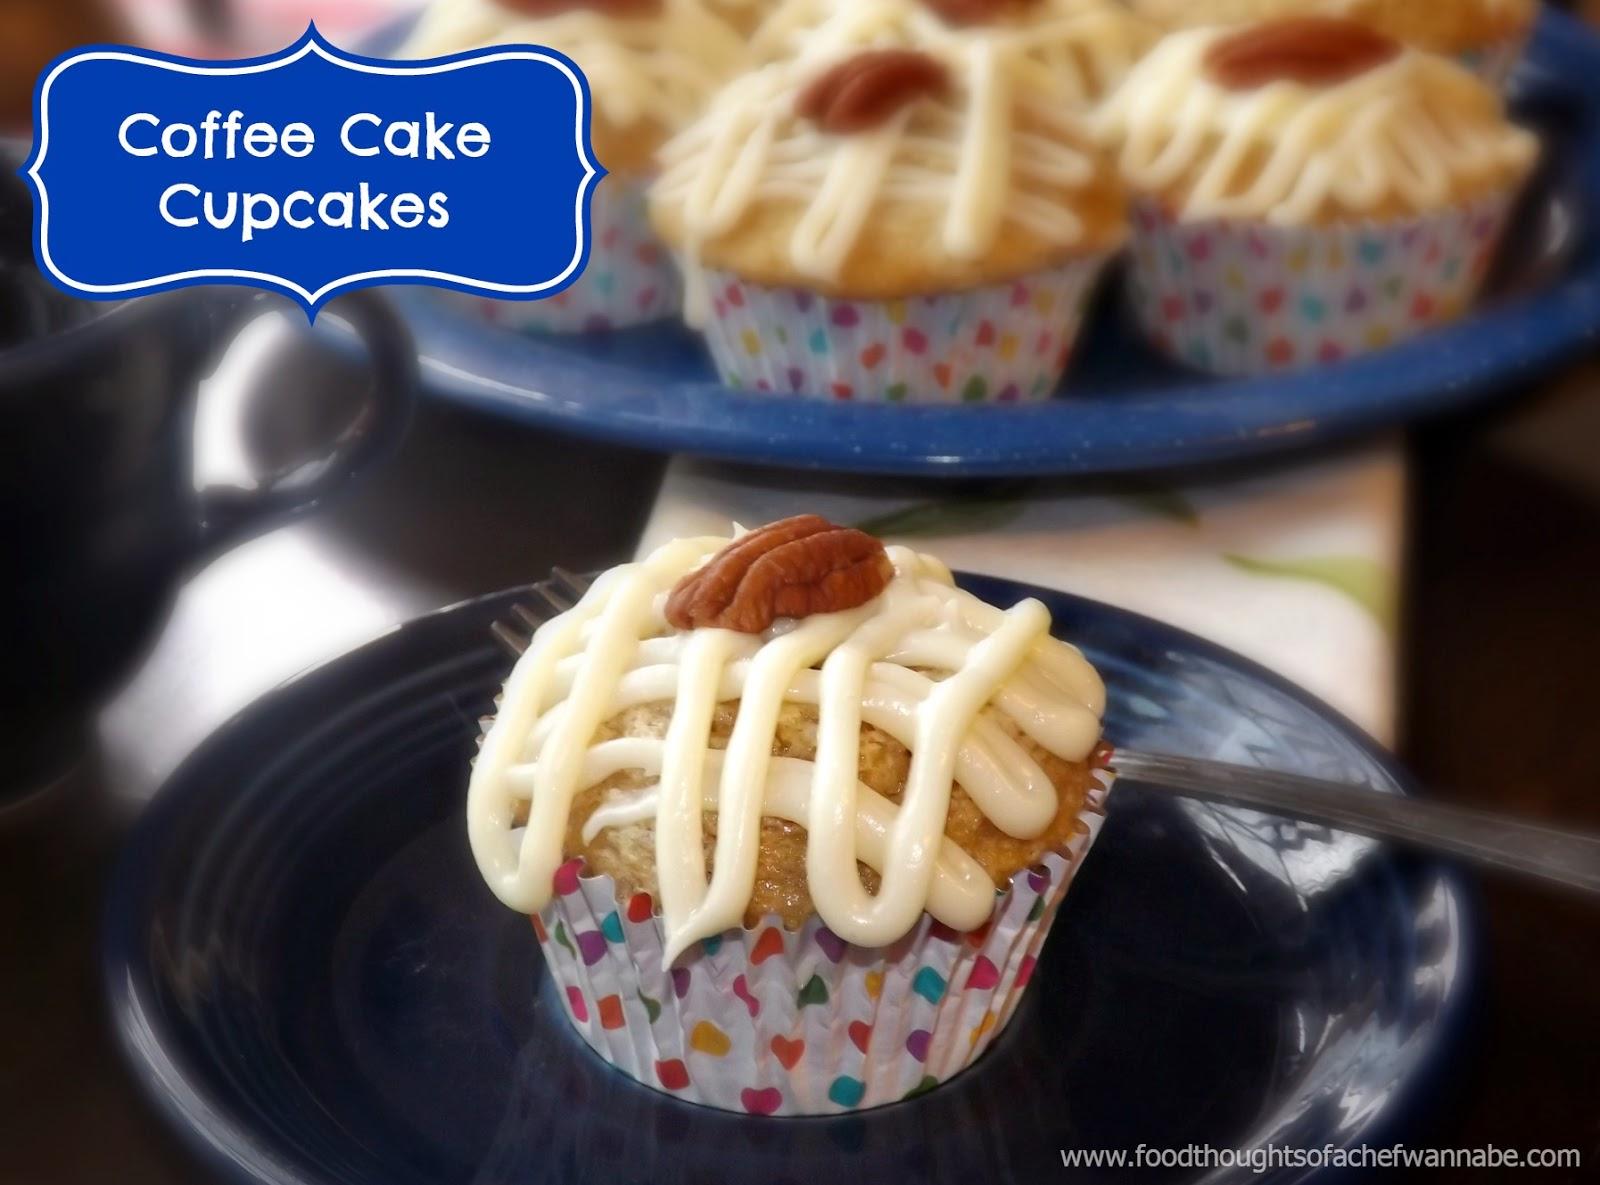 FoodThoughtsOfaChefWannabe: Coffee Cake Cupcakes!